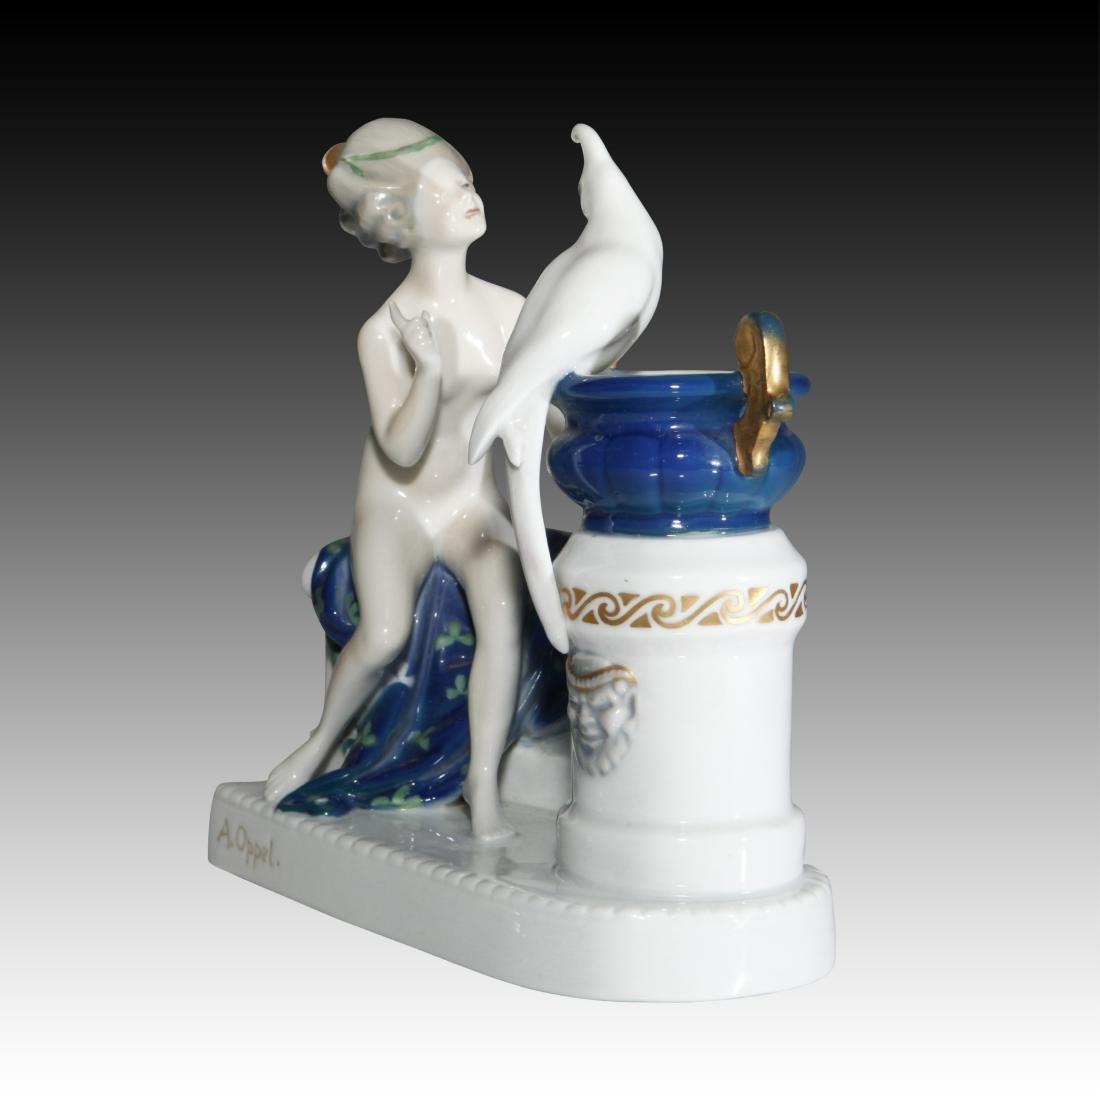 Rosenthal Figurine Nude Venus with Parrot - 2